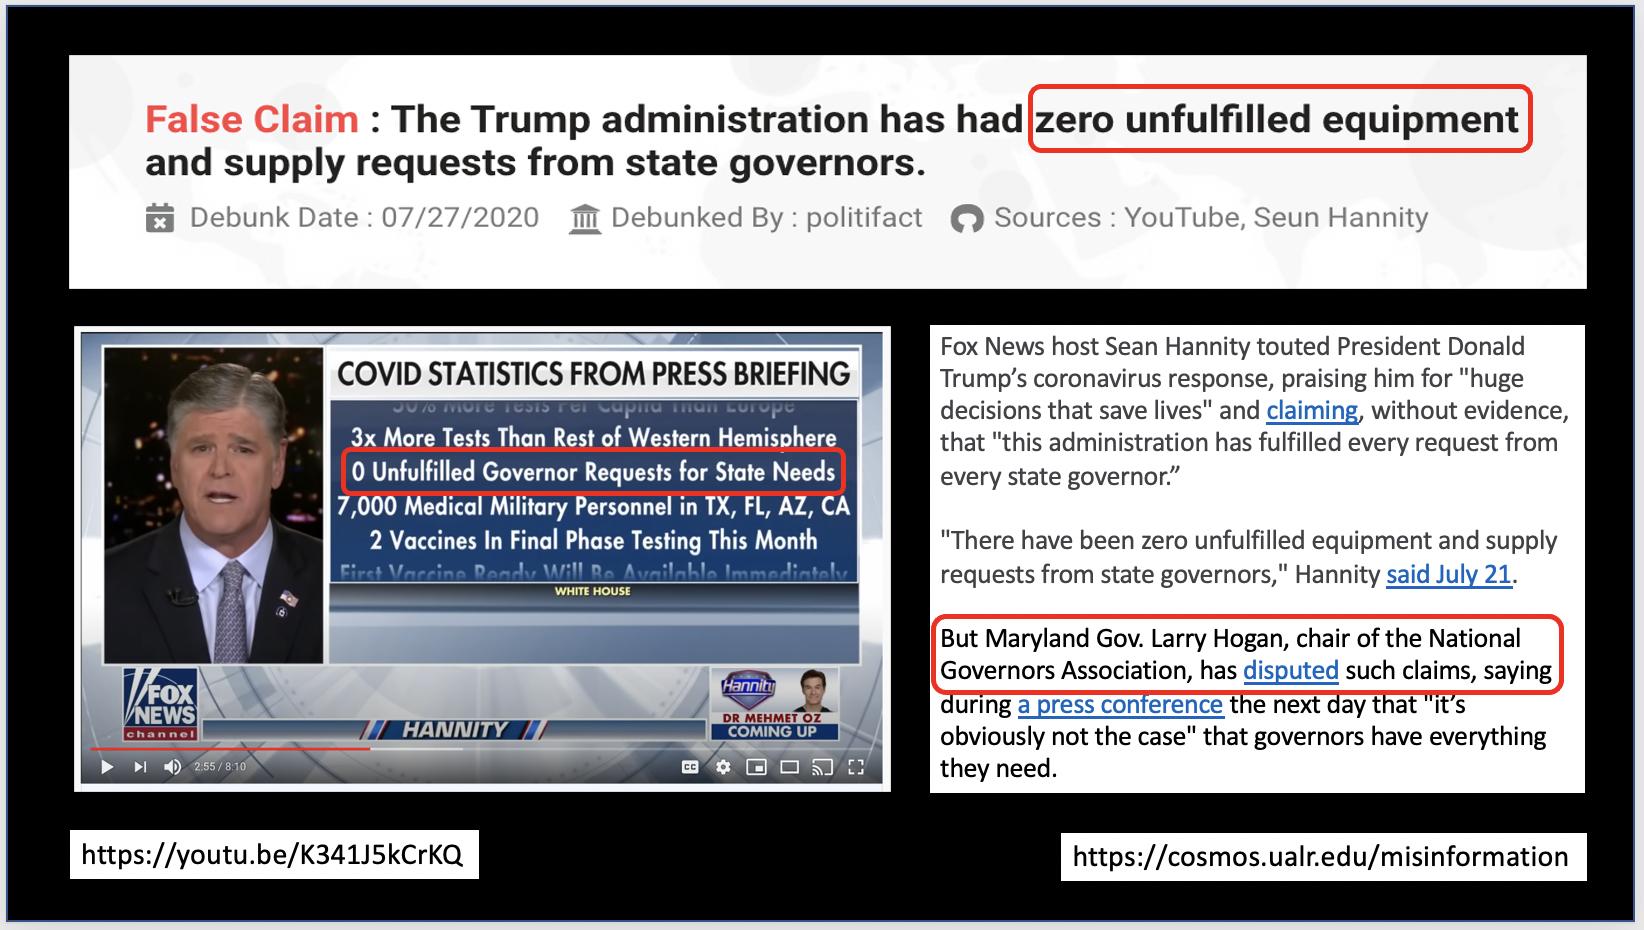 FOX propagates disinformation on YouTube.